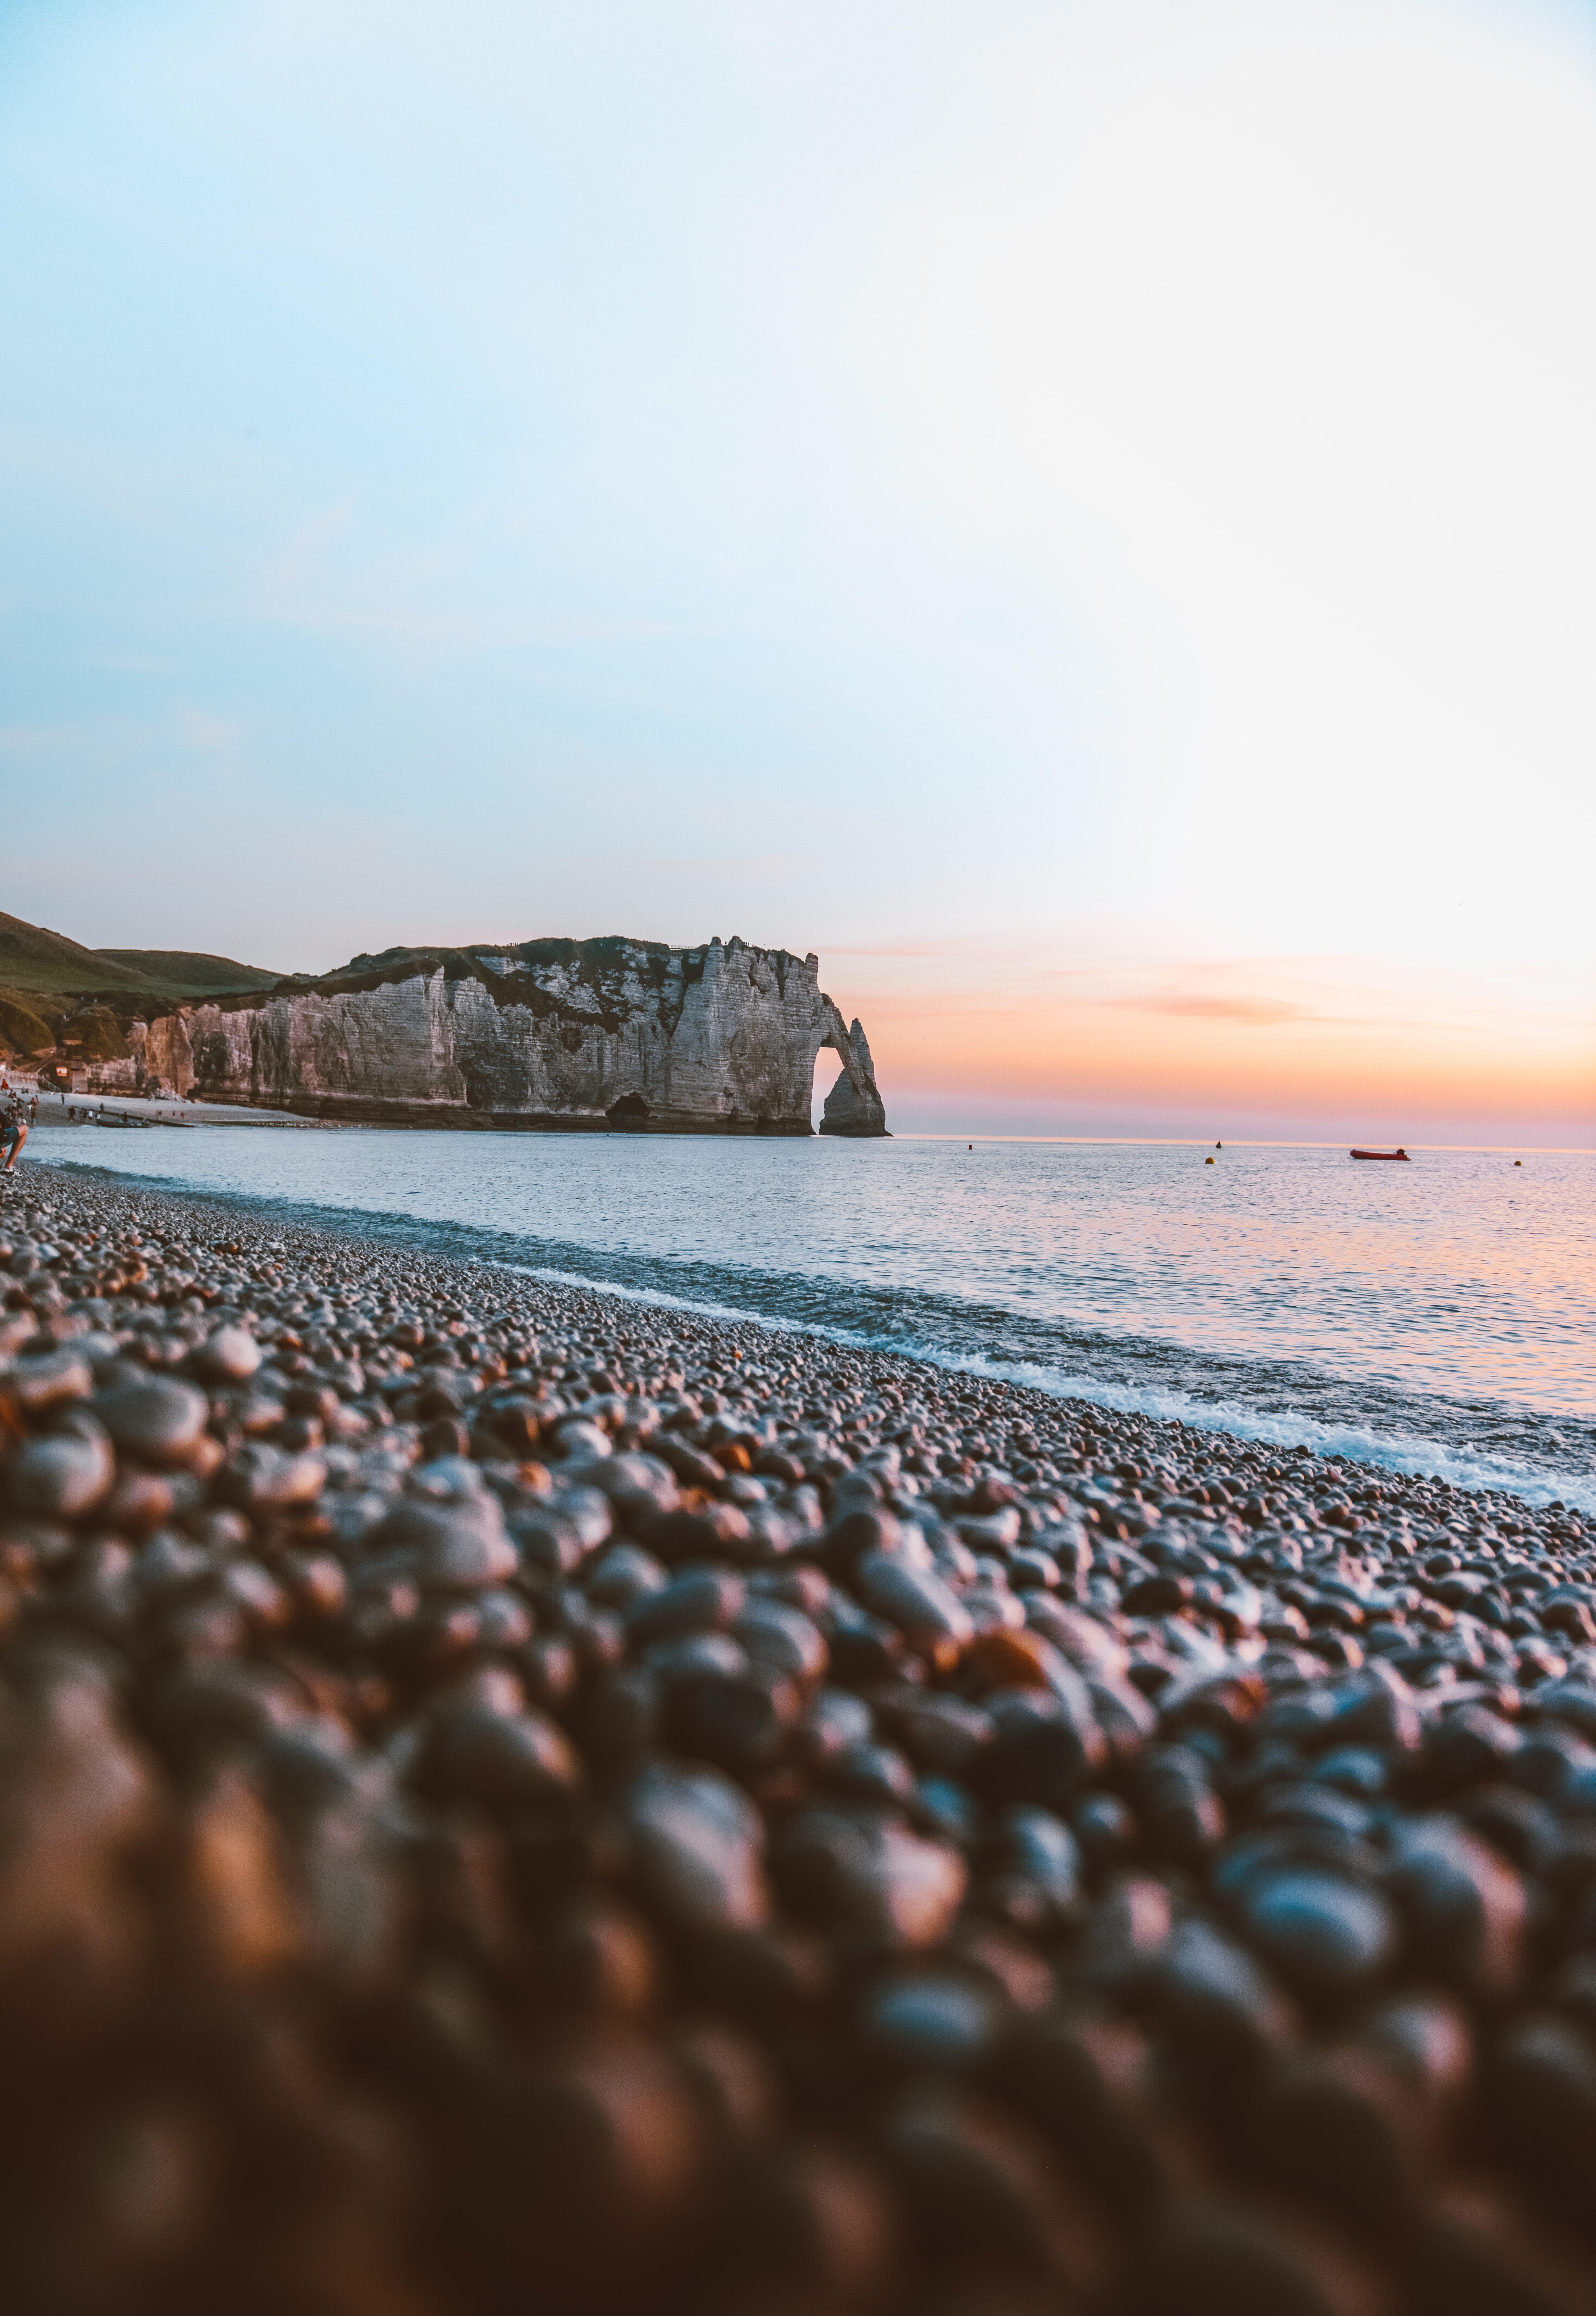 rock formation sea side taken at daytime